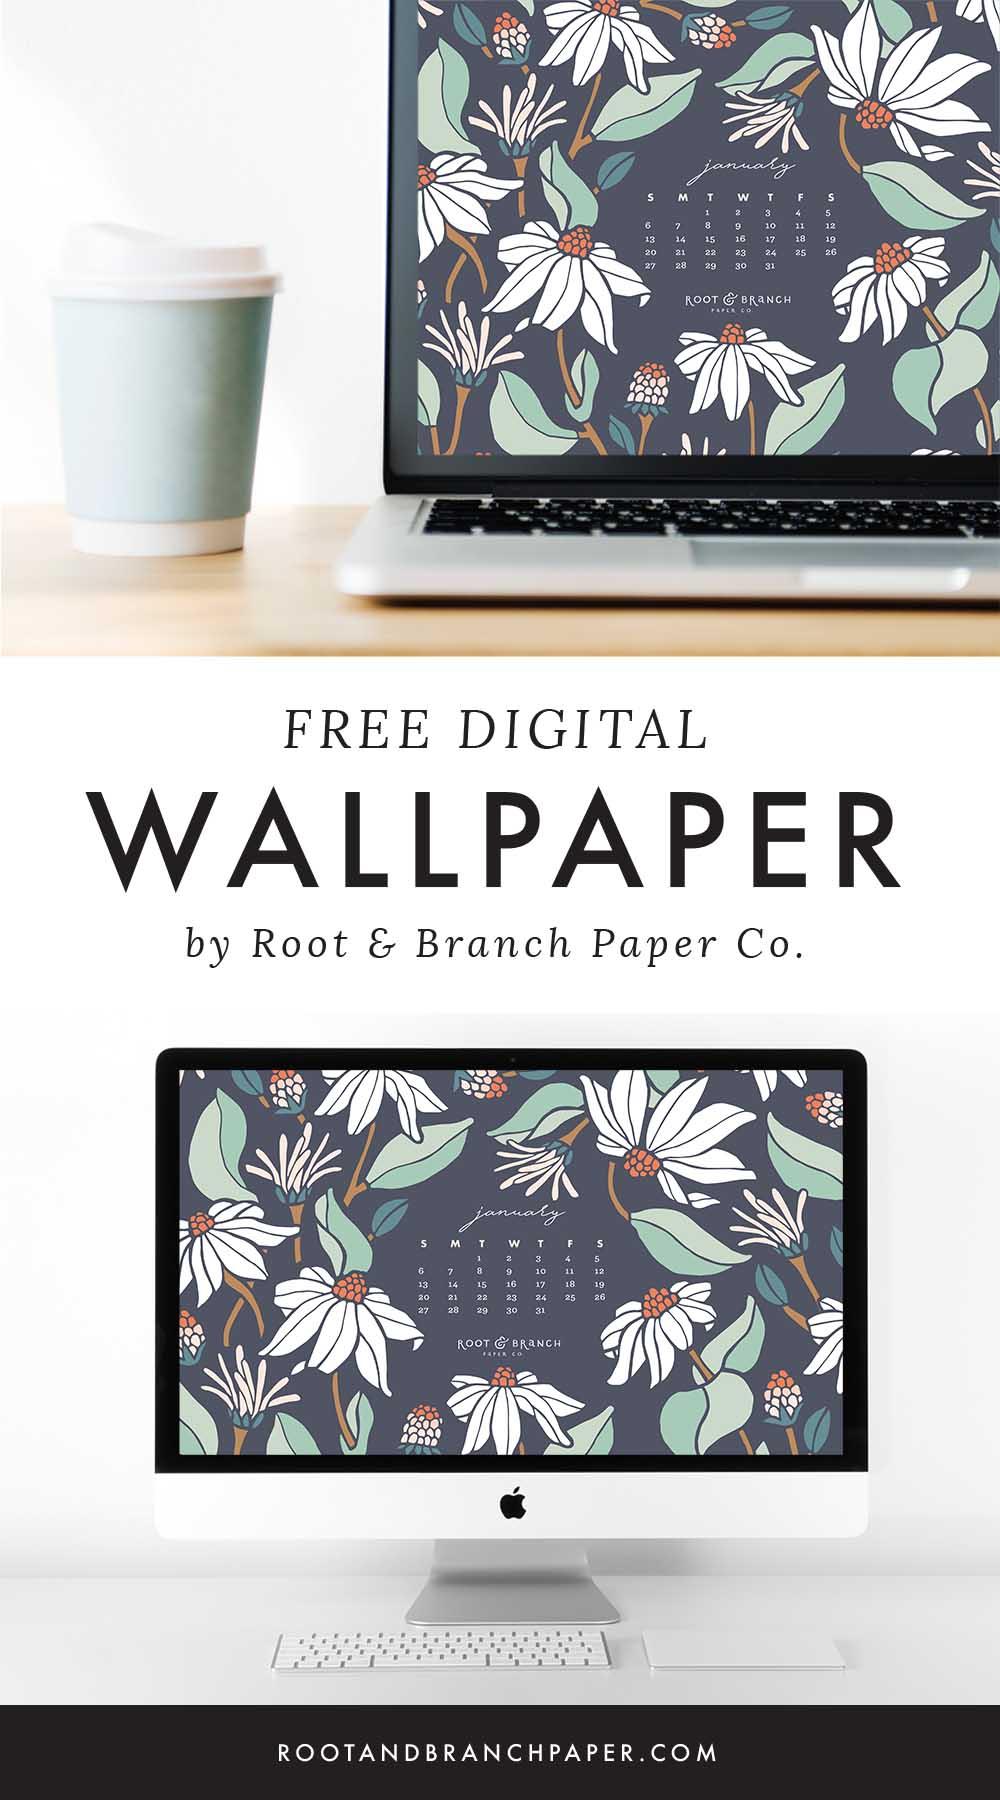 January 2019 Calendar Wallpaper, Free Digital Desktop Wallpaper, Illustrated Floral Desktop Calendar by Root & Branch Paper Co.